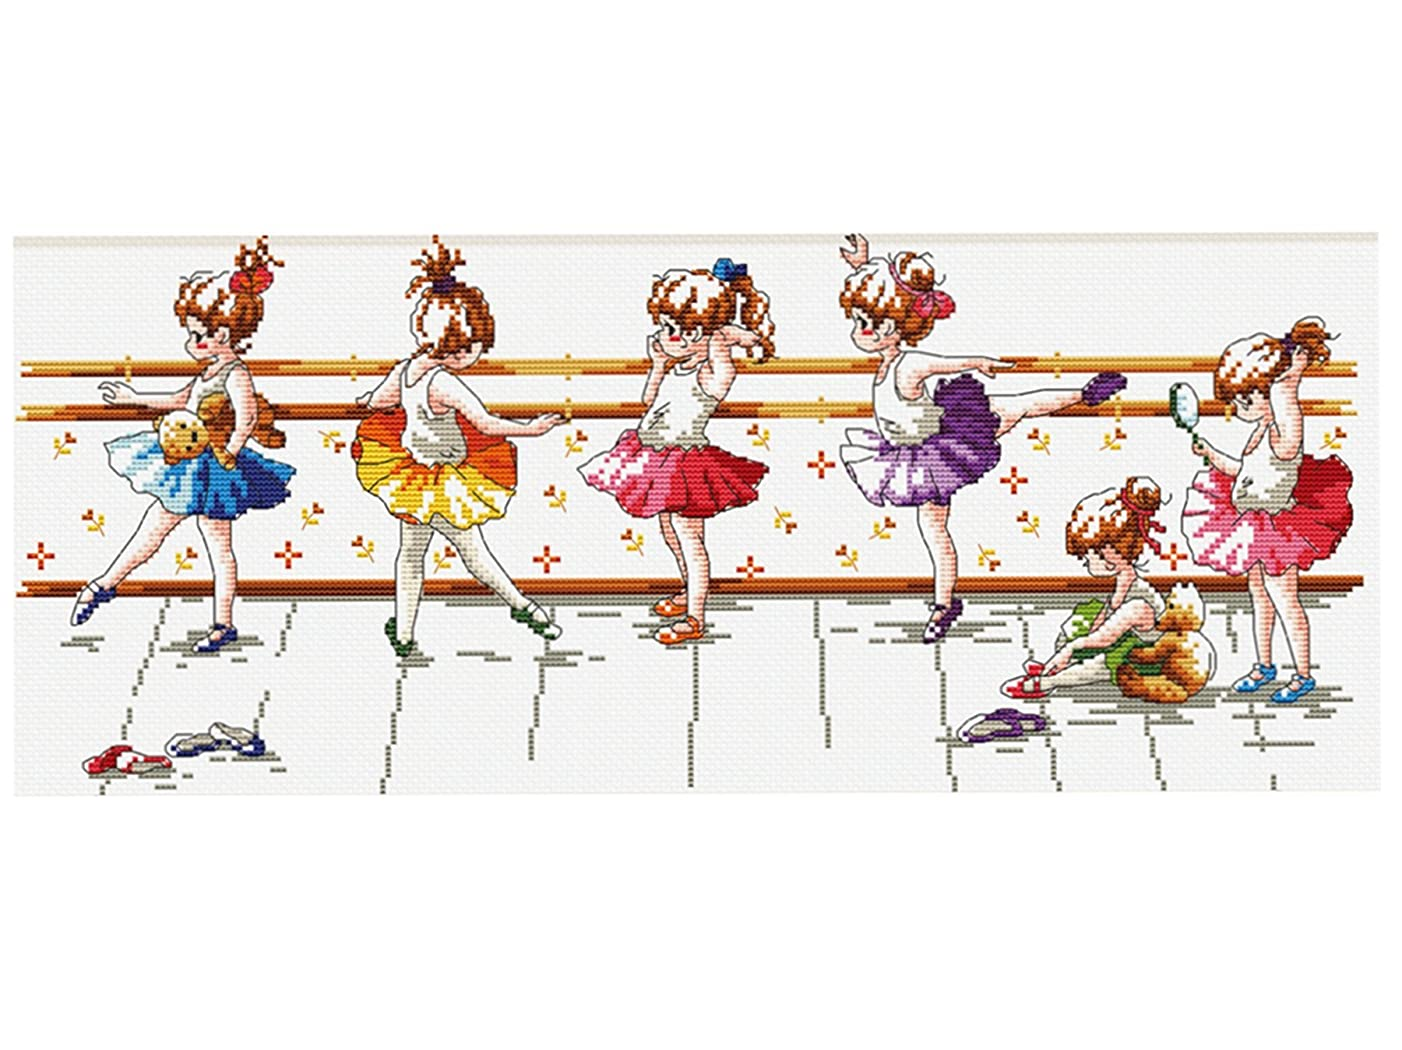 TINMI ATRS DIY Counted Cross Stitch Kits Printed Needlework Embroidery Kits 11CT Home Decor(26